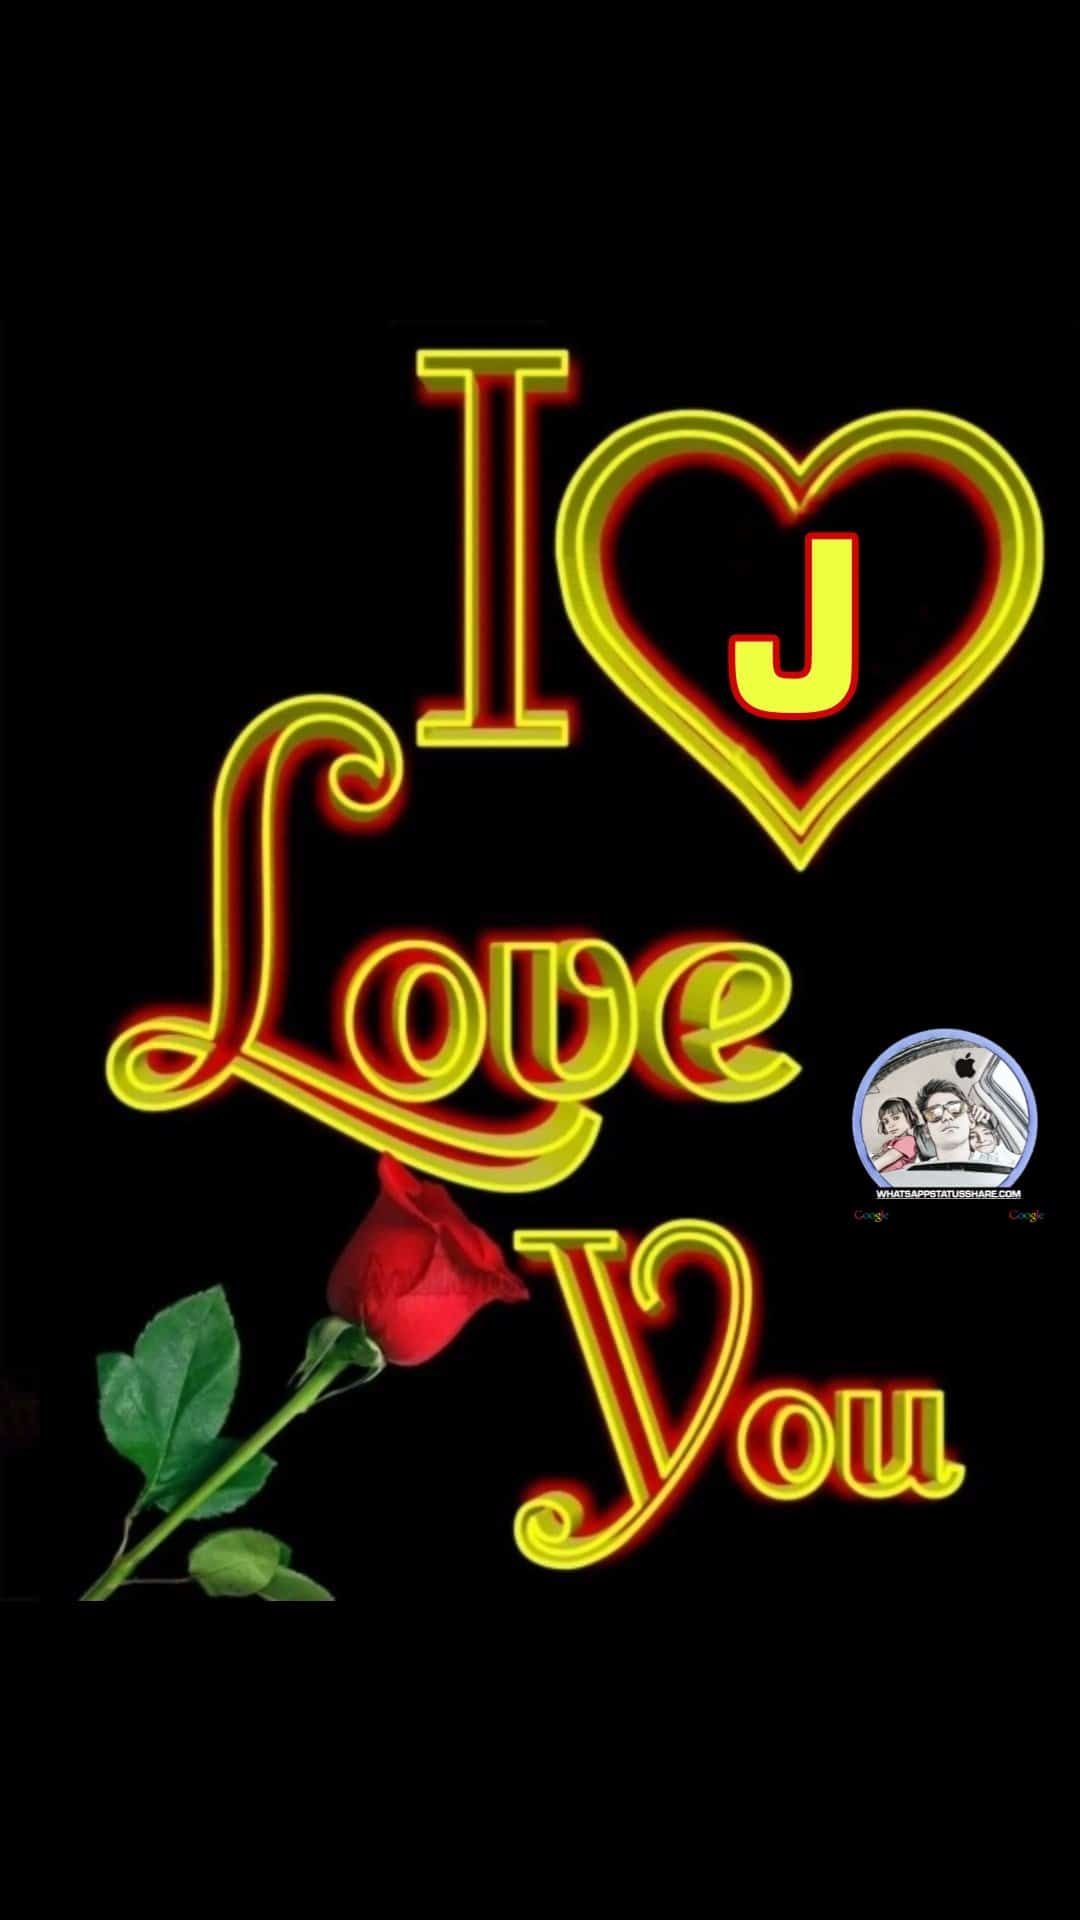 I Love You J I Love You All Namert Nameart 2021 Love Nameart 2021 In 2021 My Name Wallpaper P Words Name Wallpaper